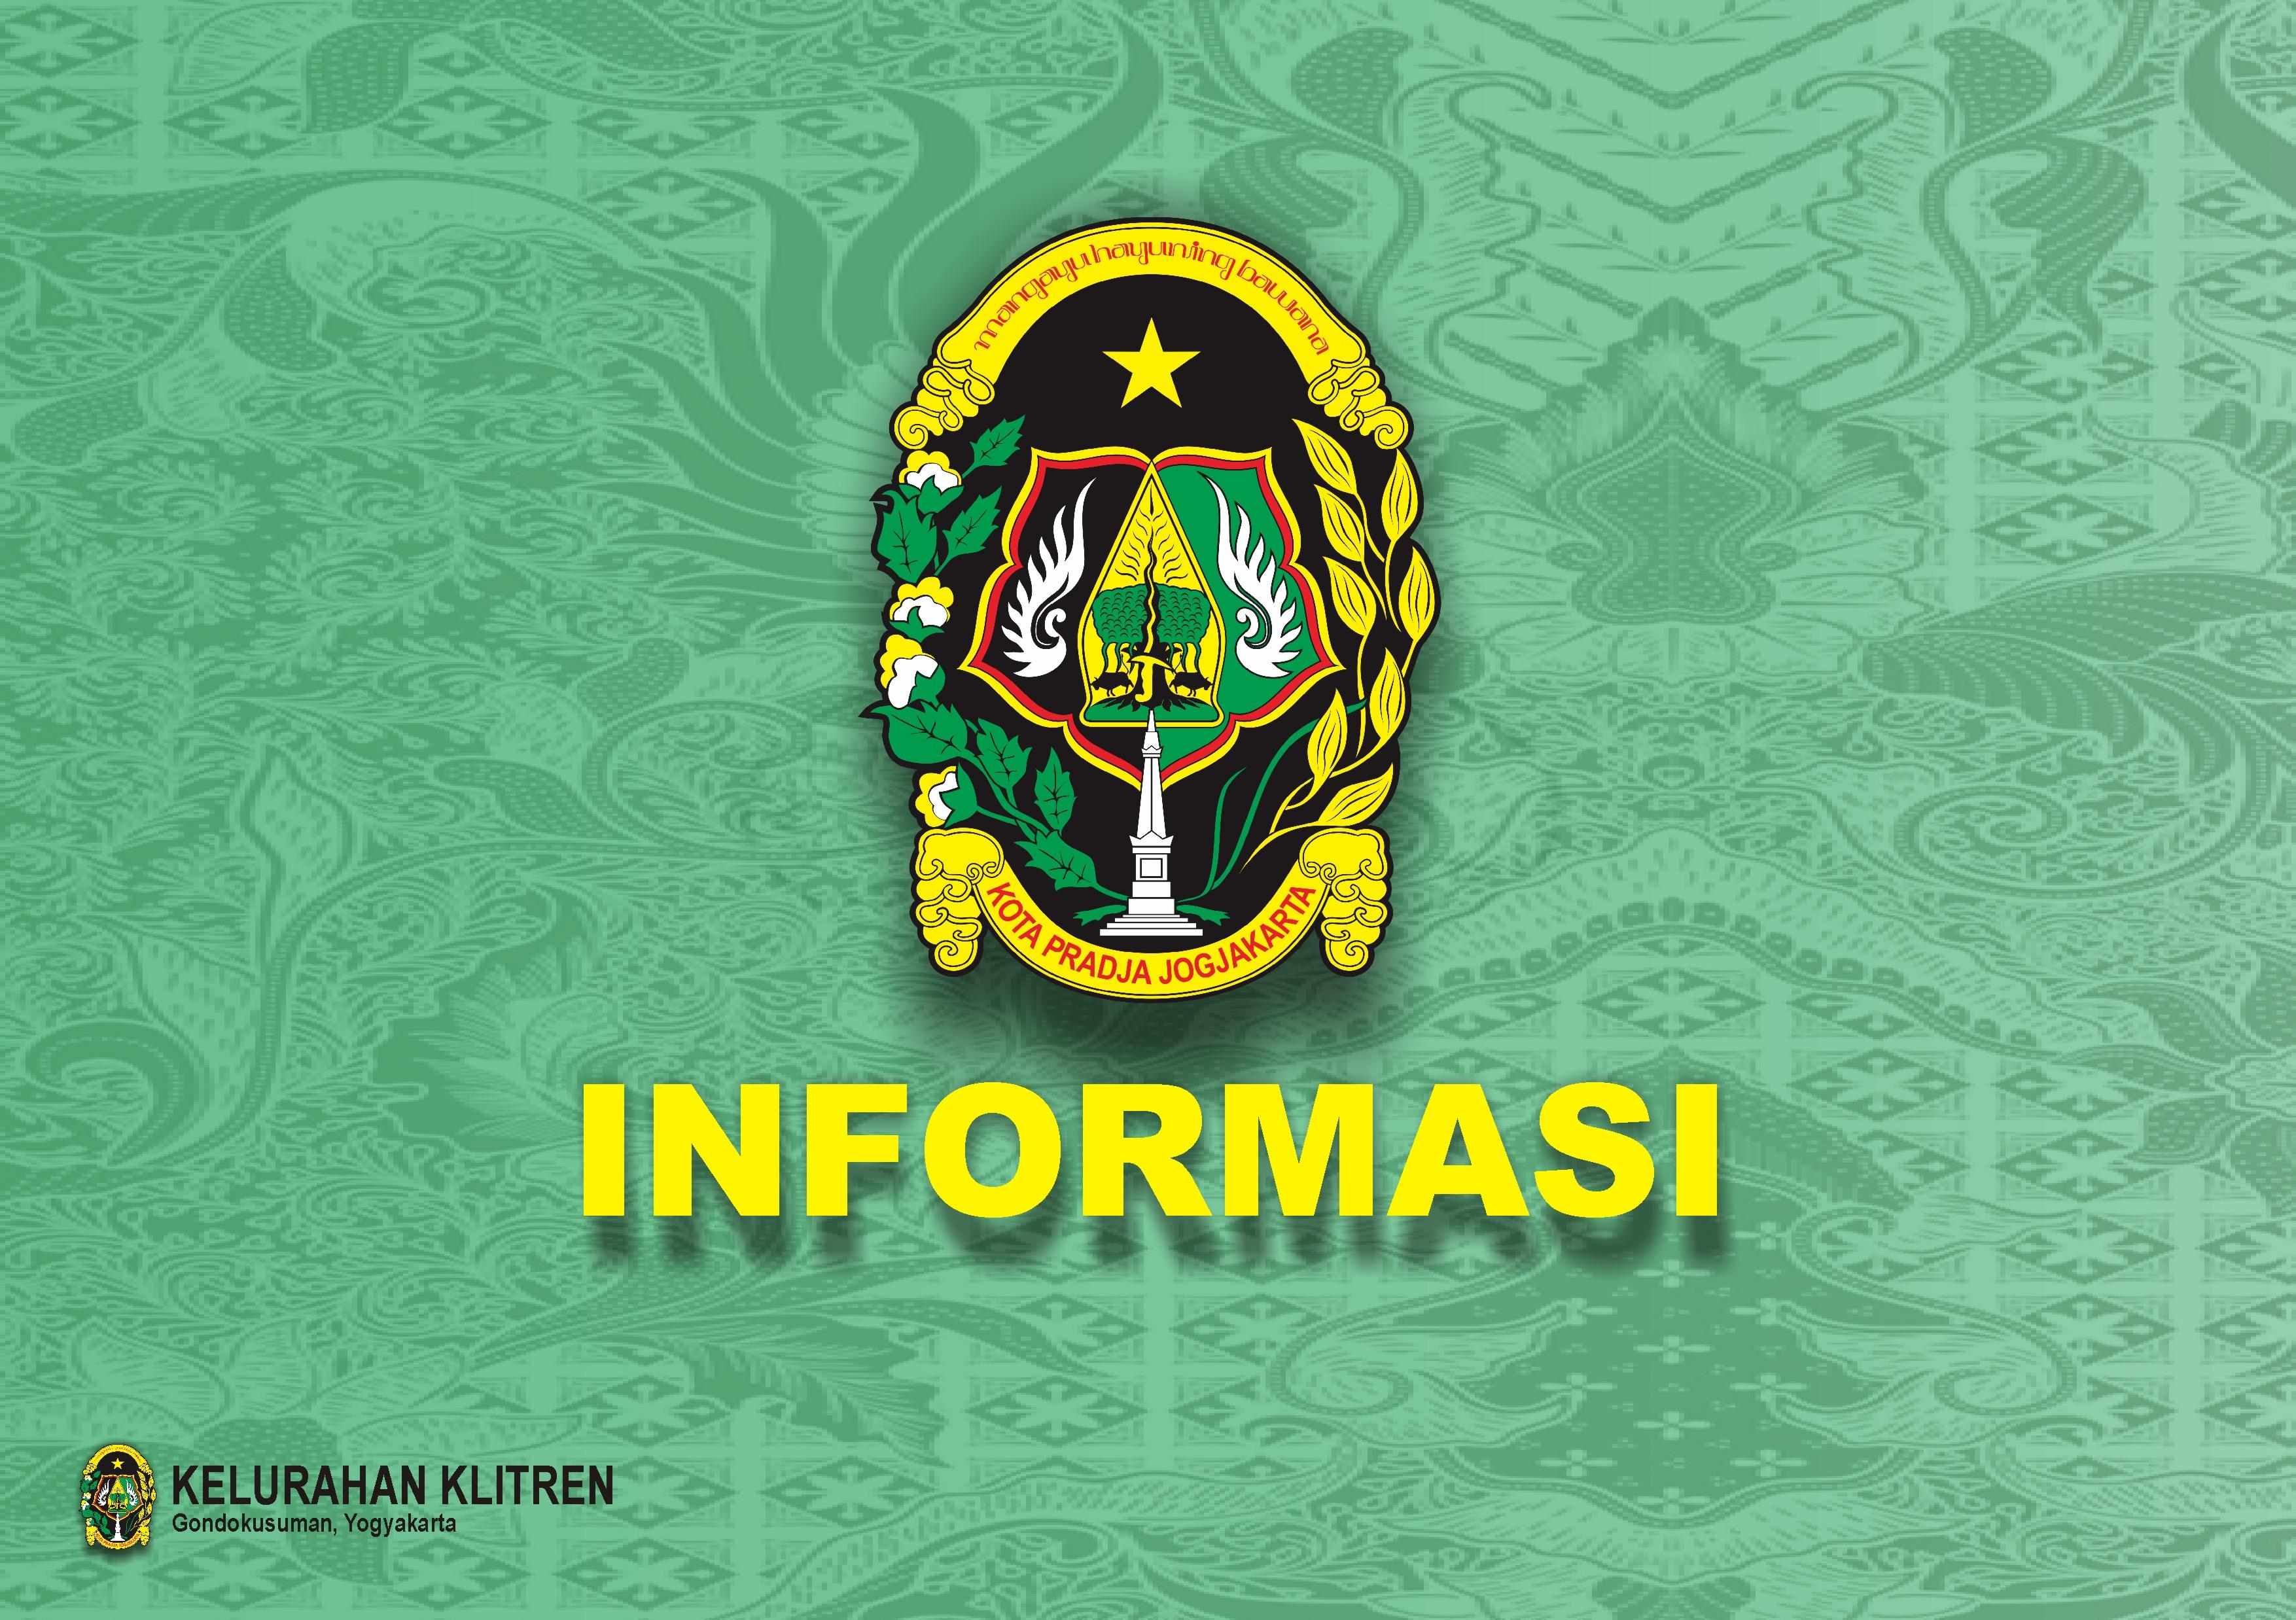 Penghapusan Sanksi Admisitratif Berupa Denda Atas Tunggakan PBB di Kota Yogyakarta